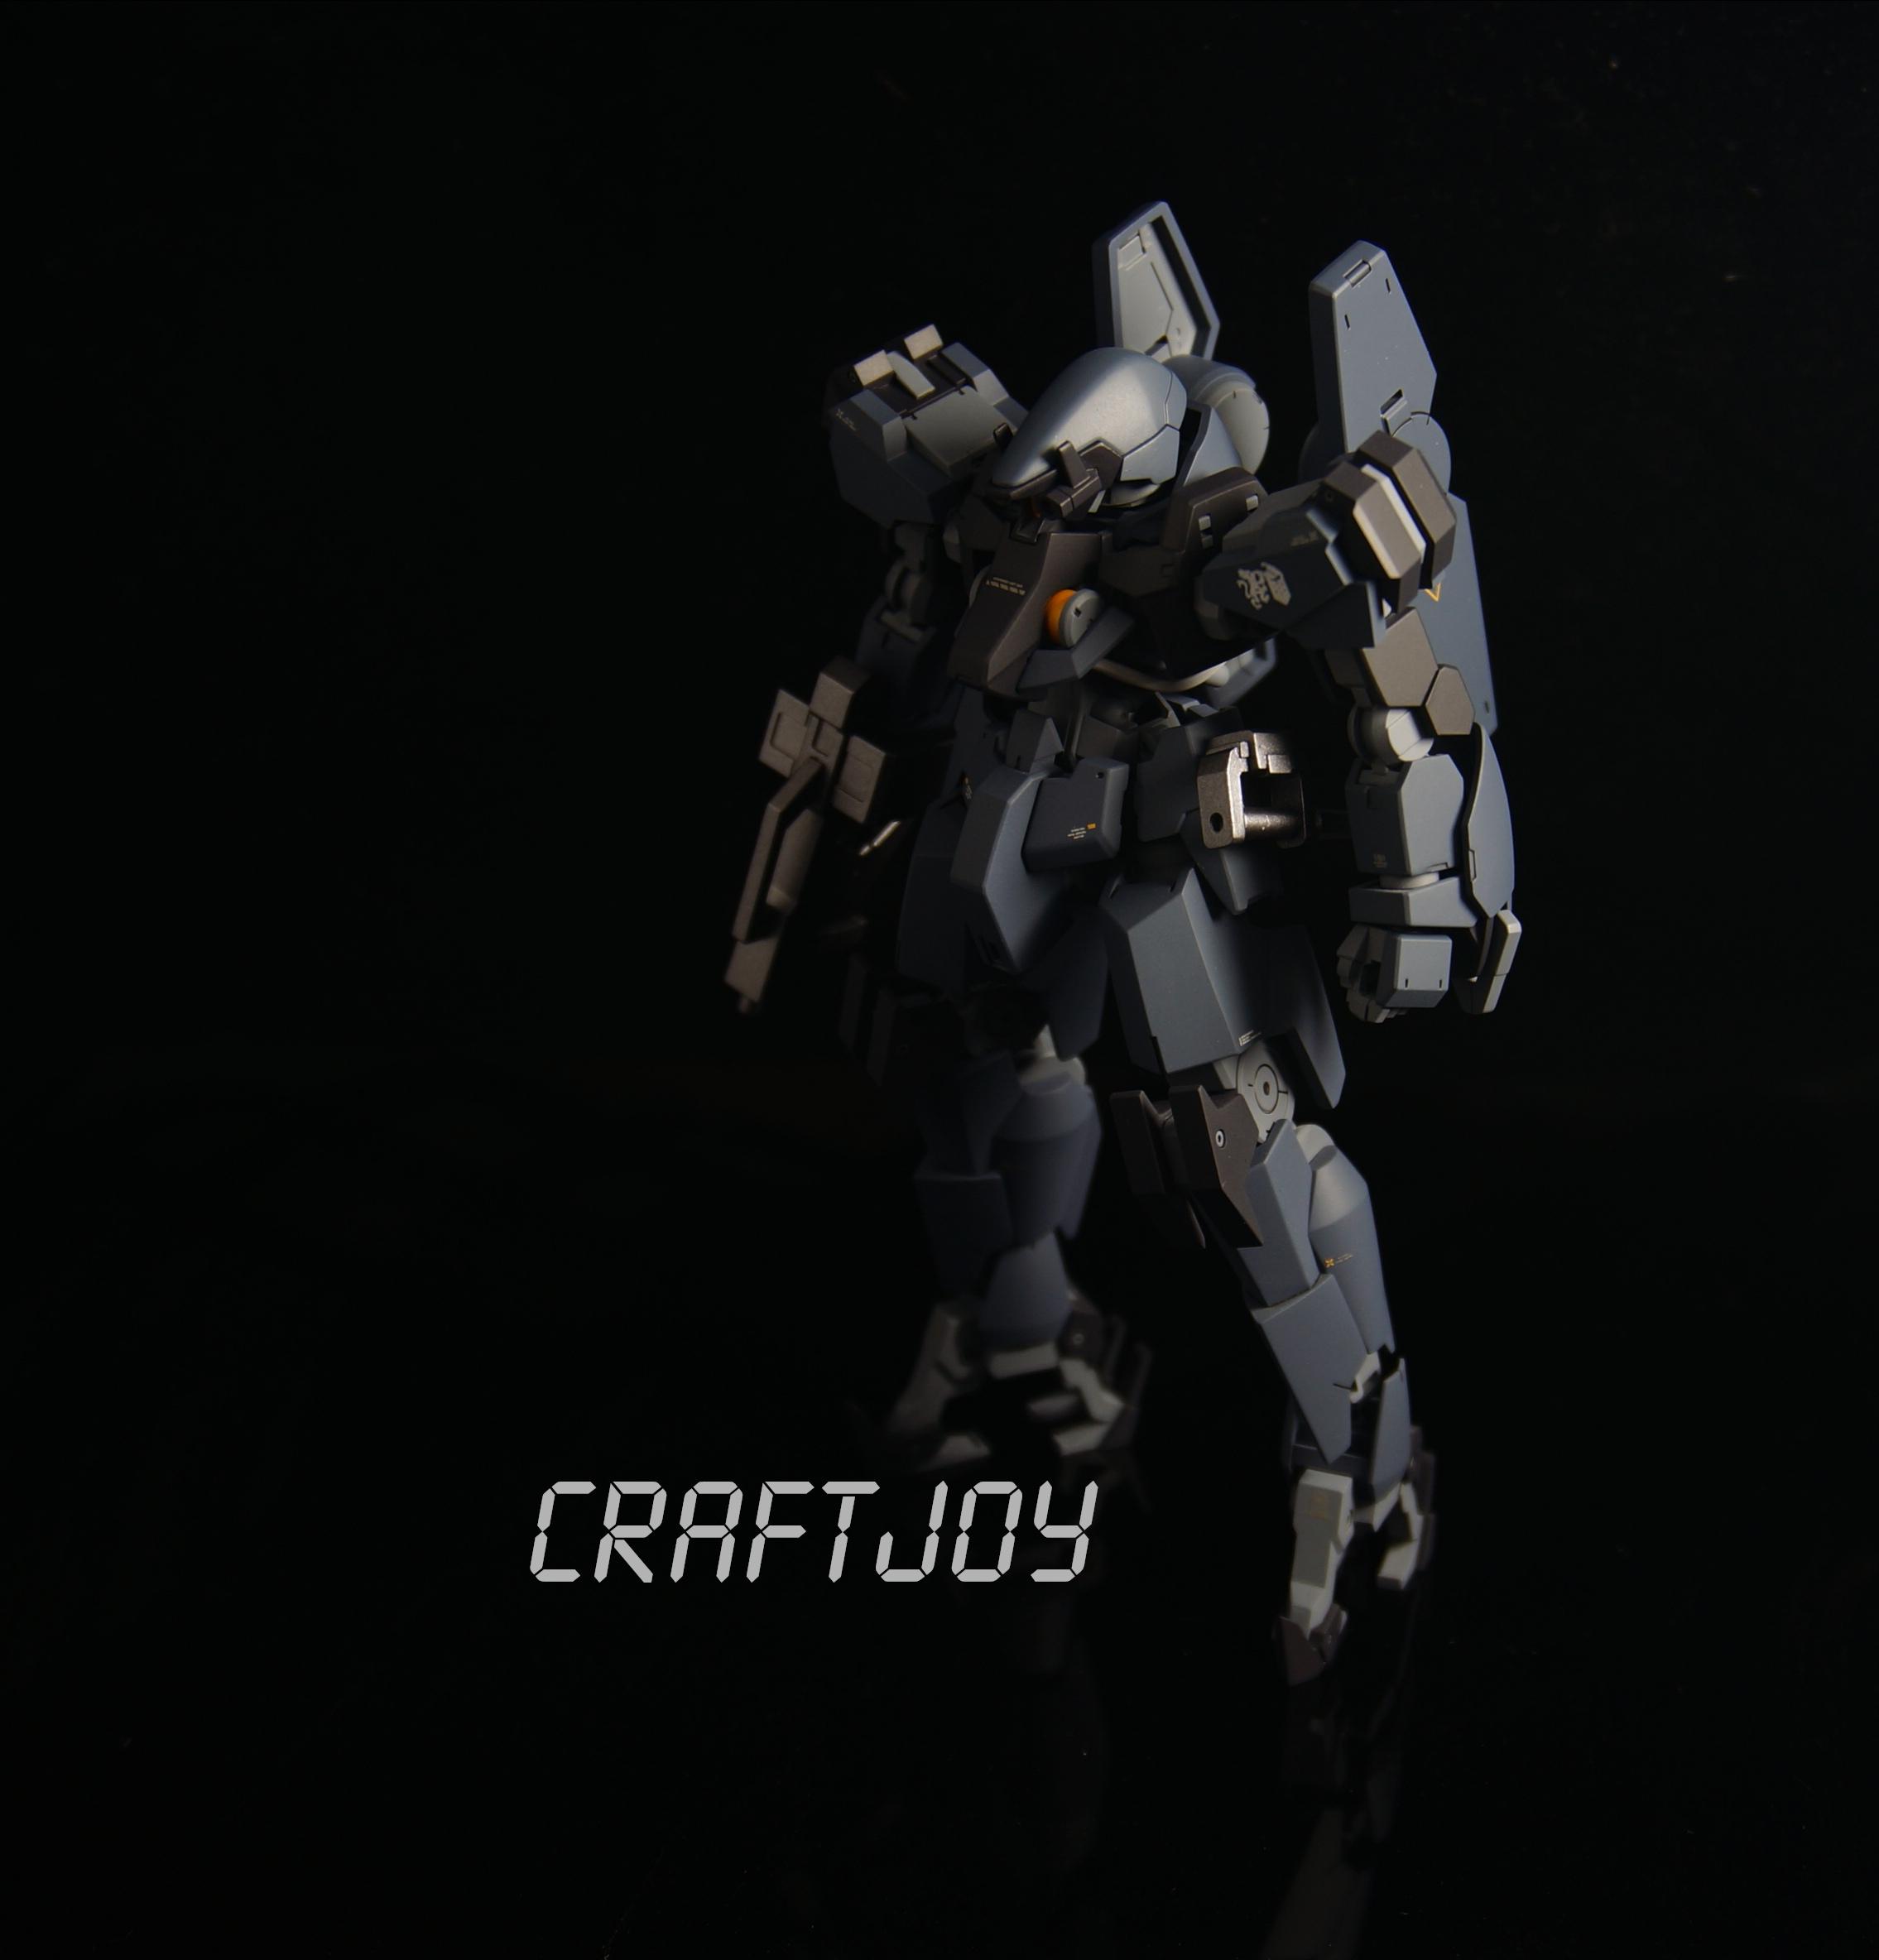 G622_GK_carftjoy_eb_06n_001.jpg